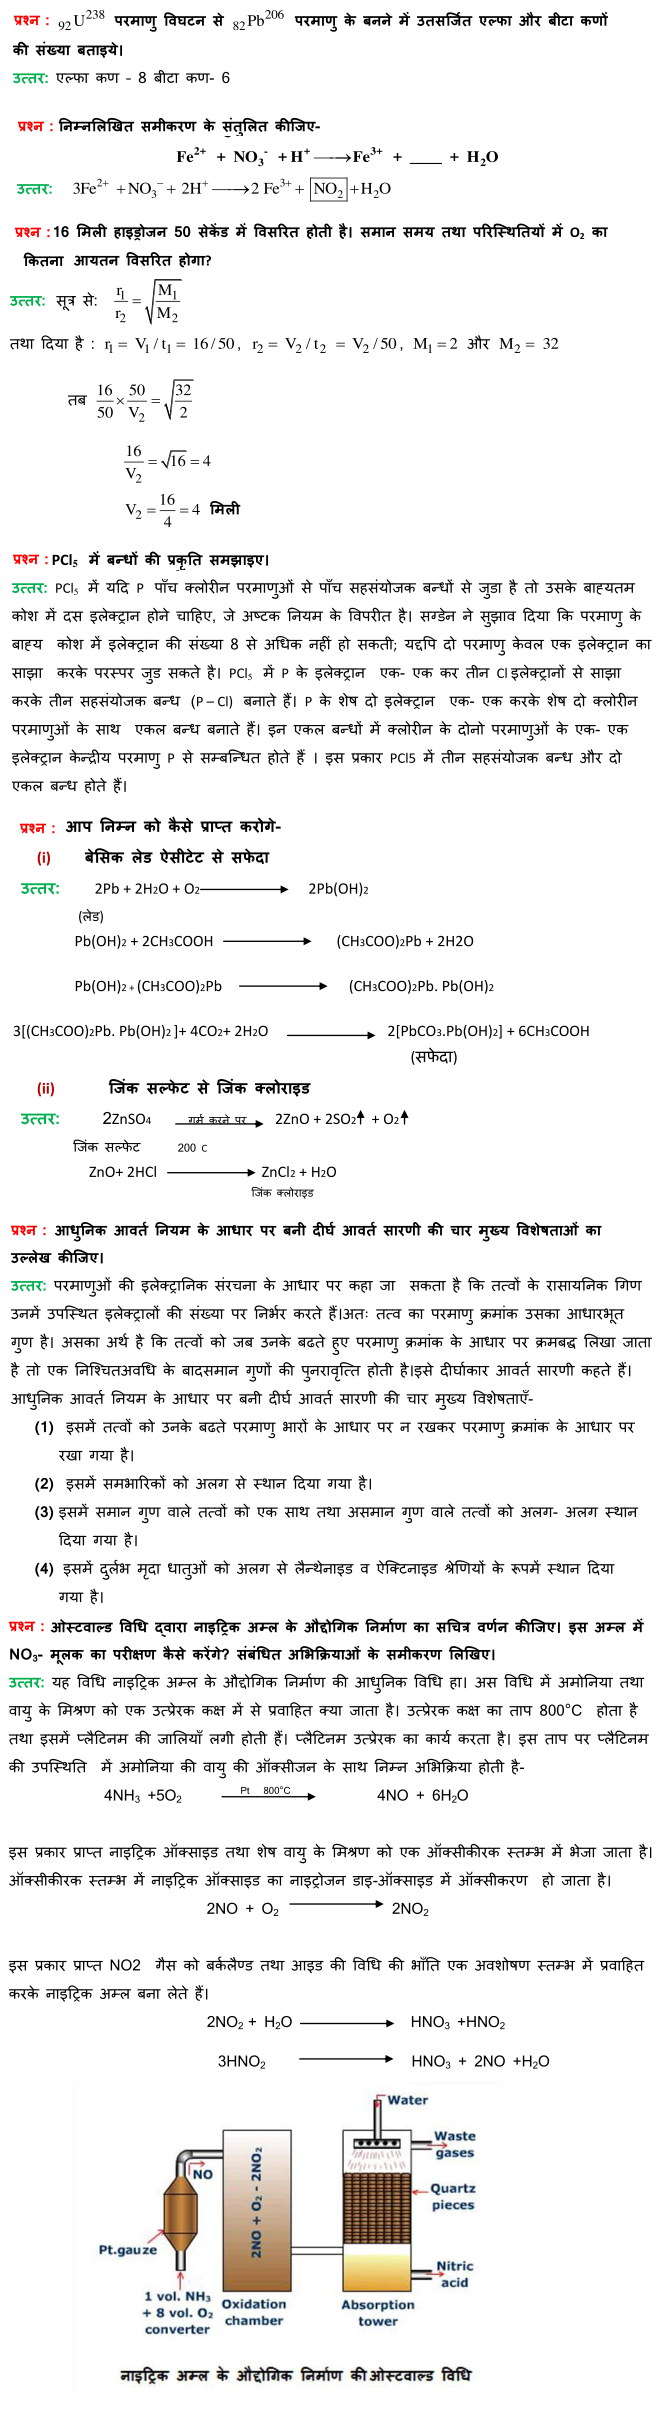 Chemistry design prac essay